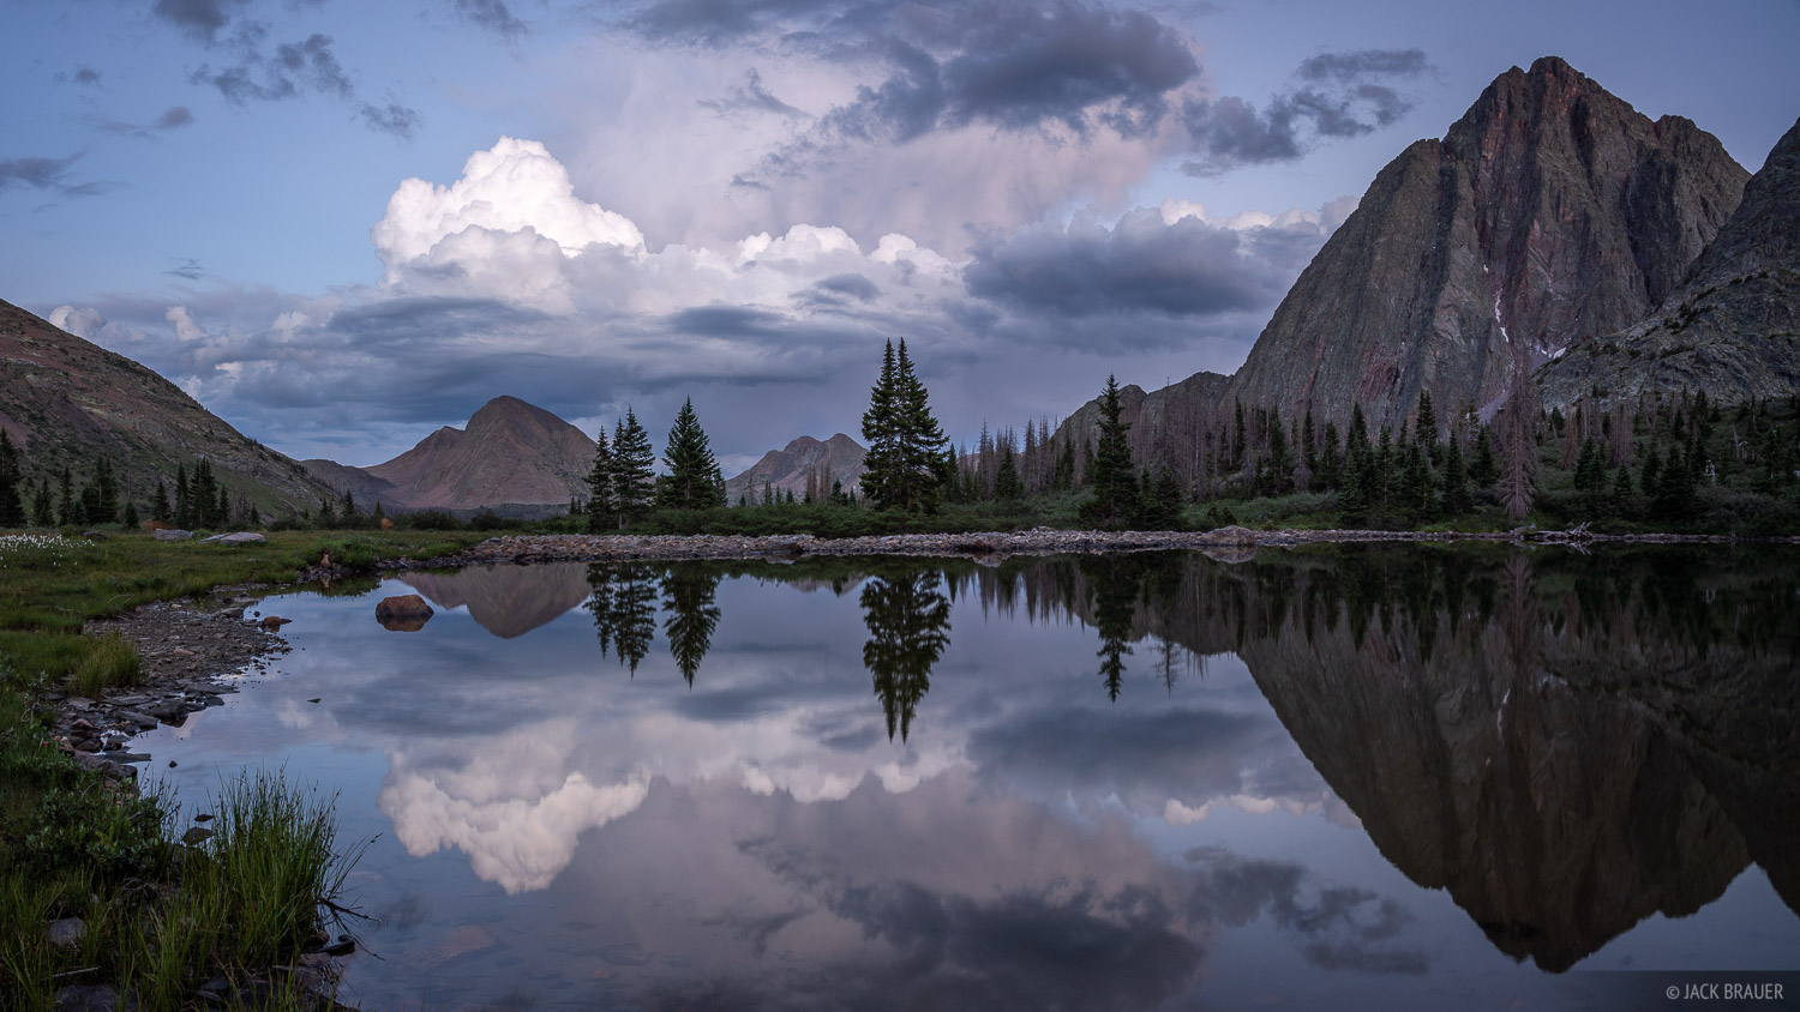 Colorado, Mount Nebo, San Juan Mountains, Weminuche Wilderness, reflection, photo